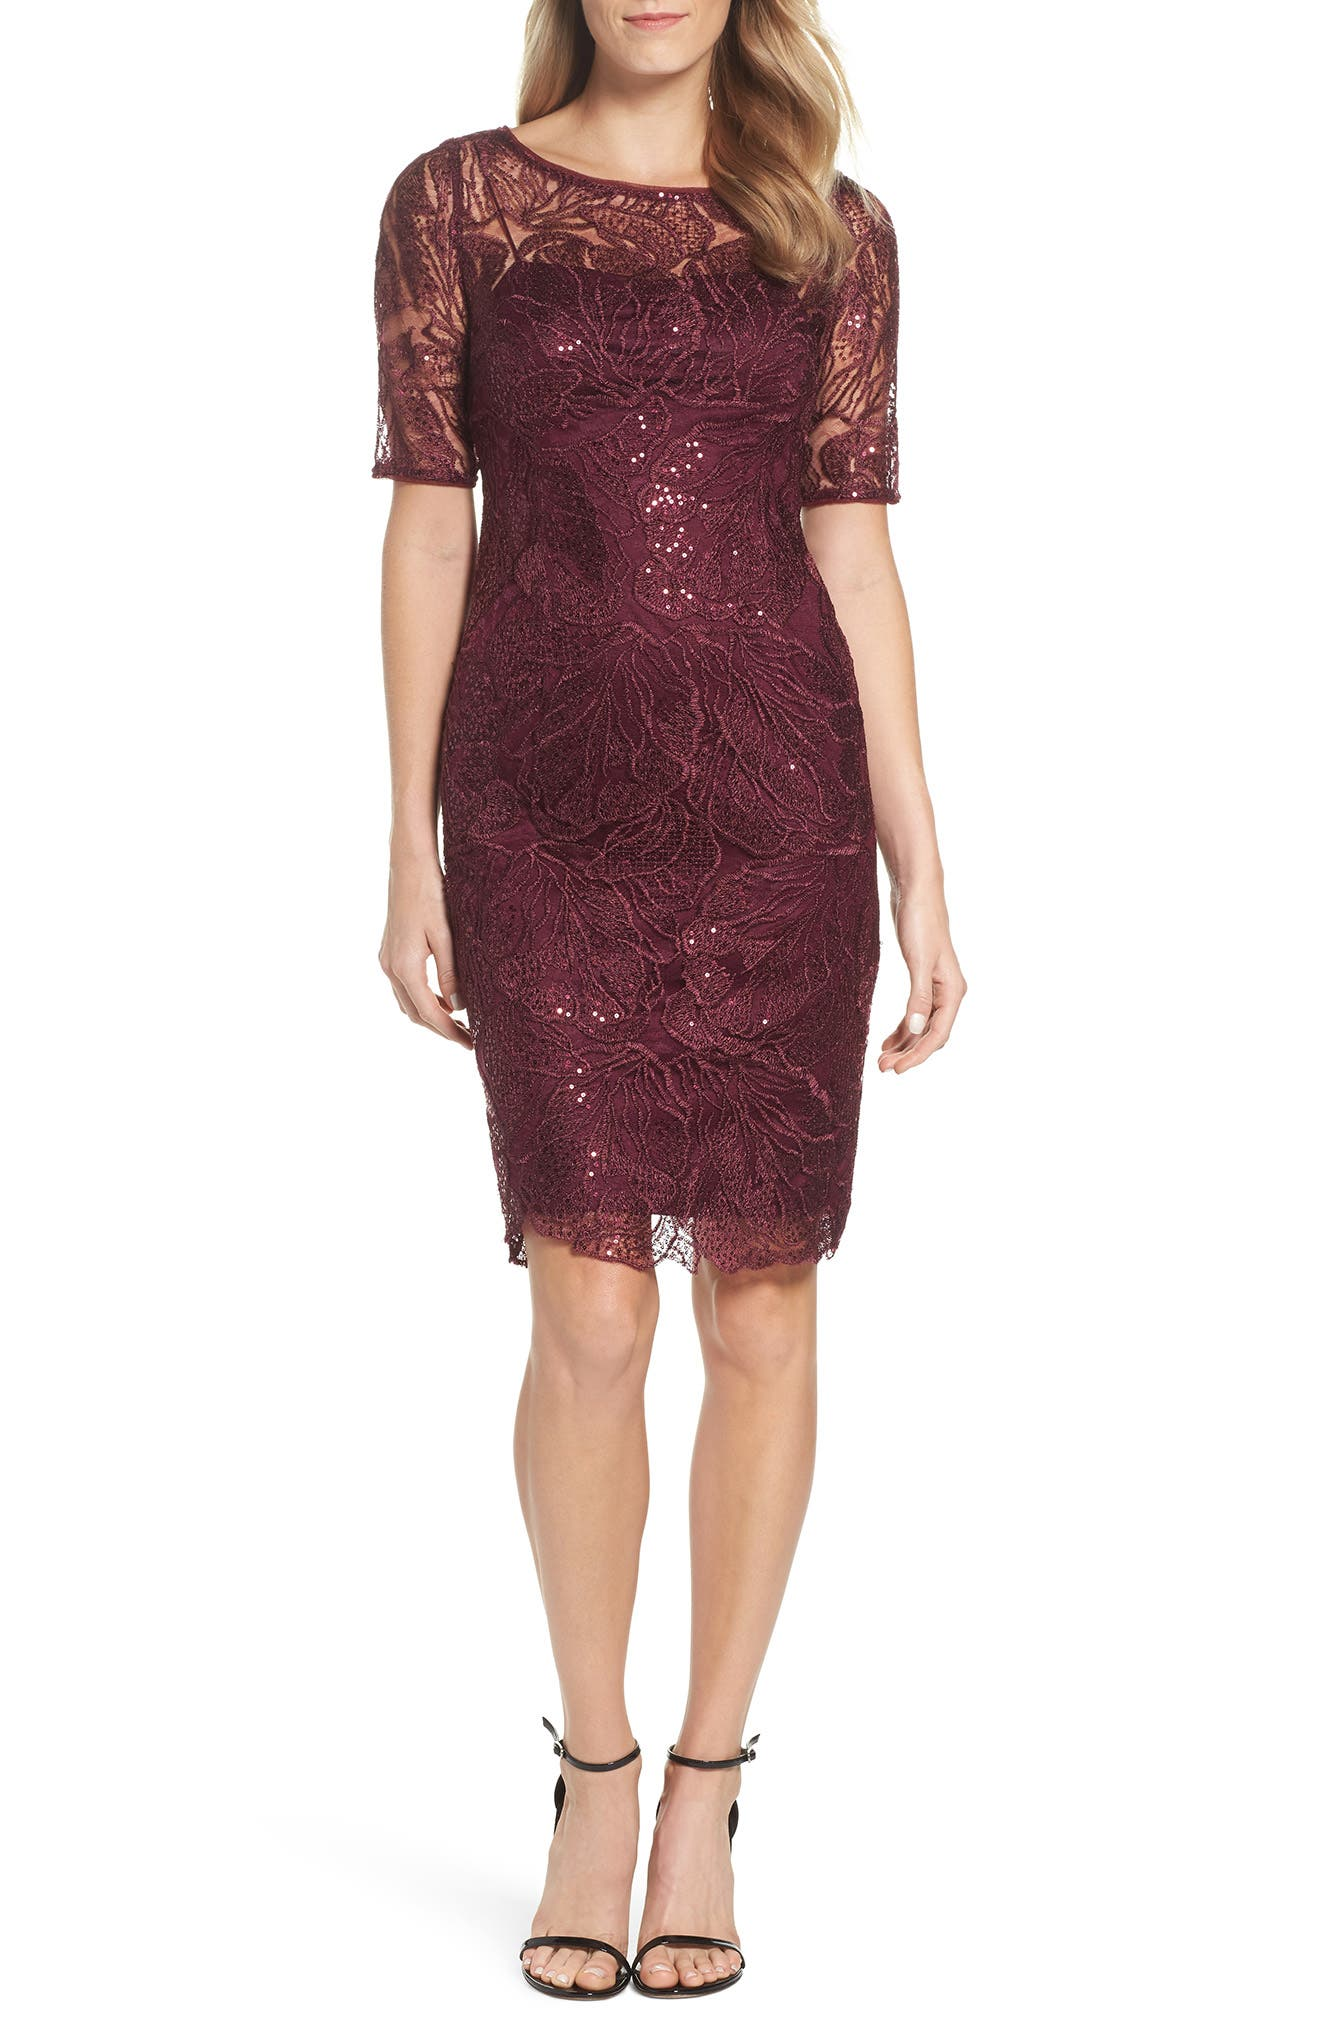 Main Image - Adrianna Papell Sequin Embellished Sheath Dress (Regular & Petite)